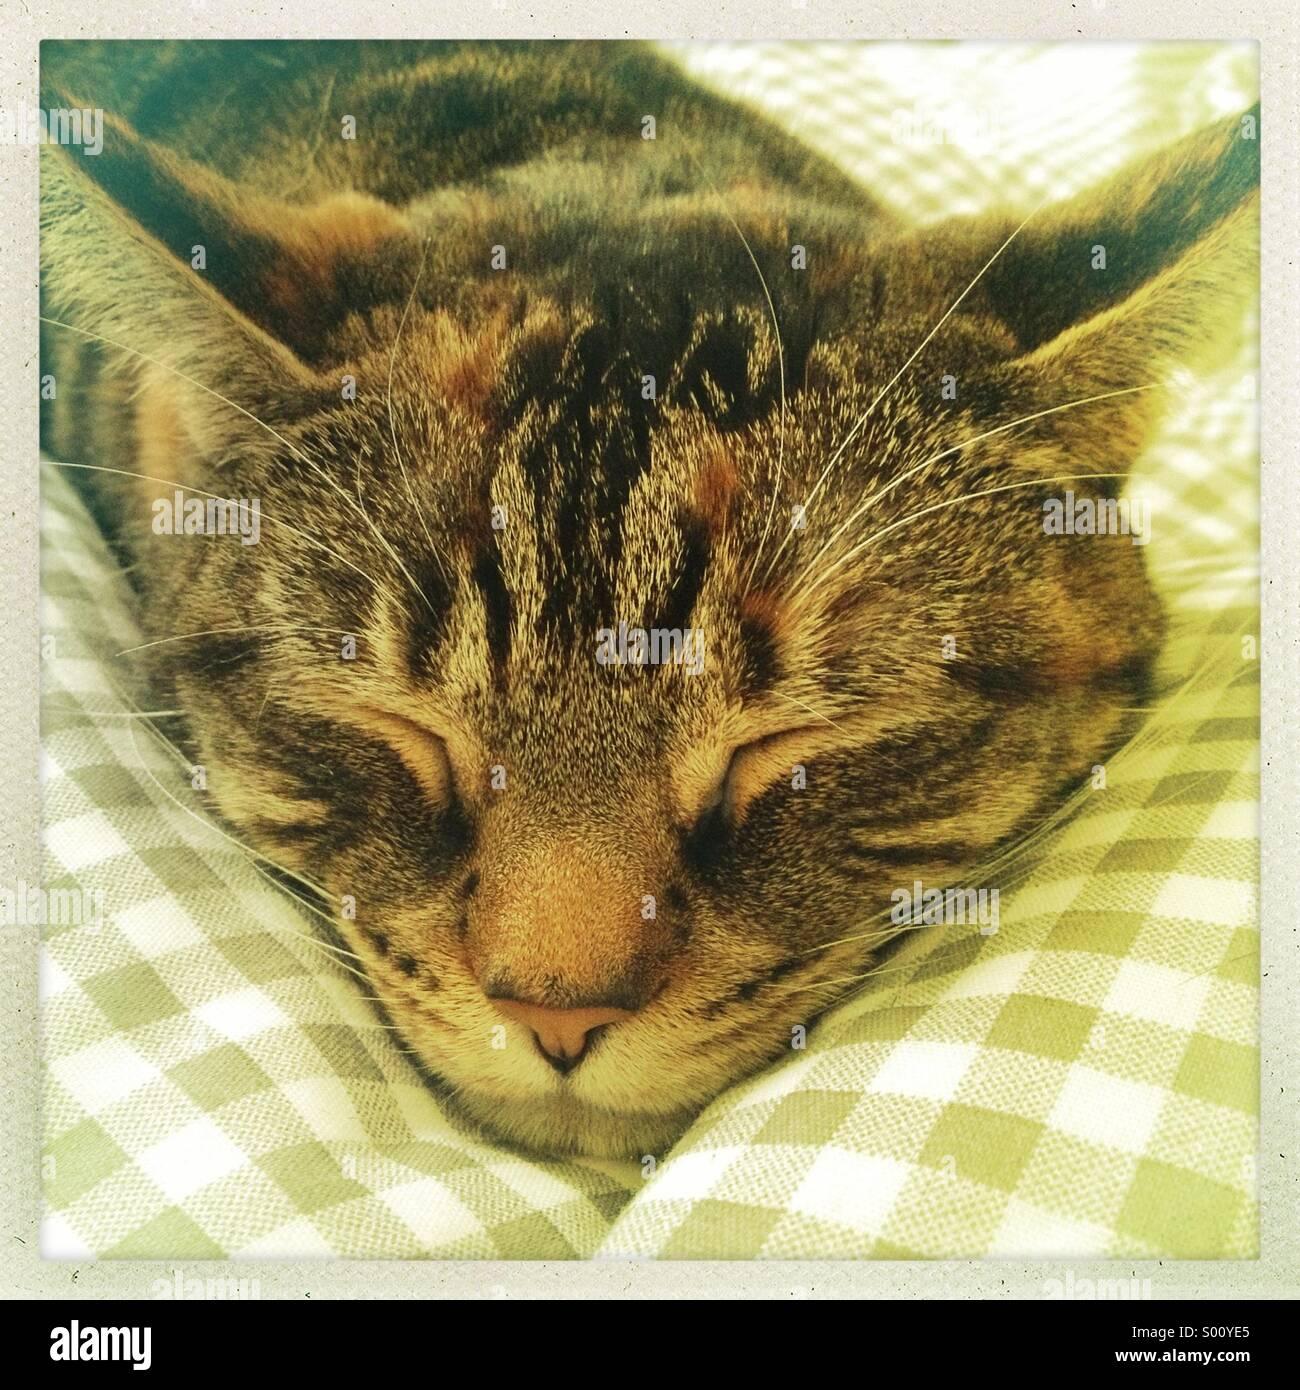 Cat Sleeping On Back On Dashboard